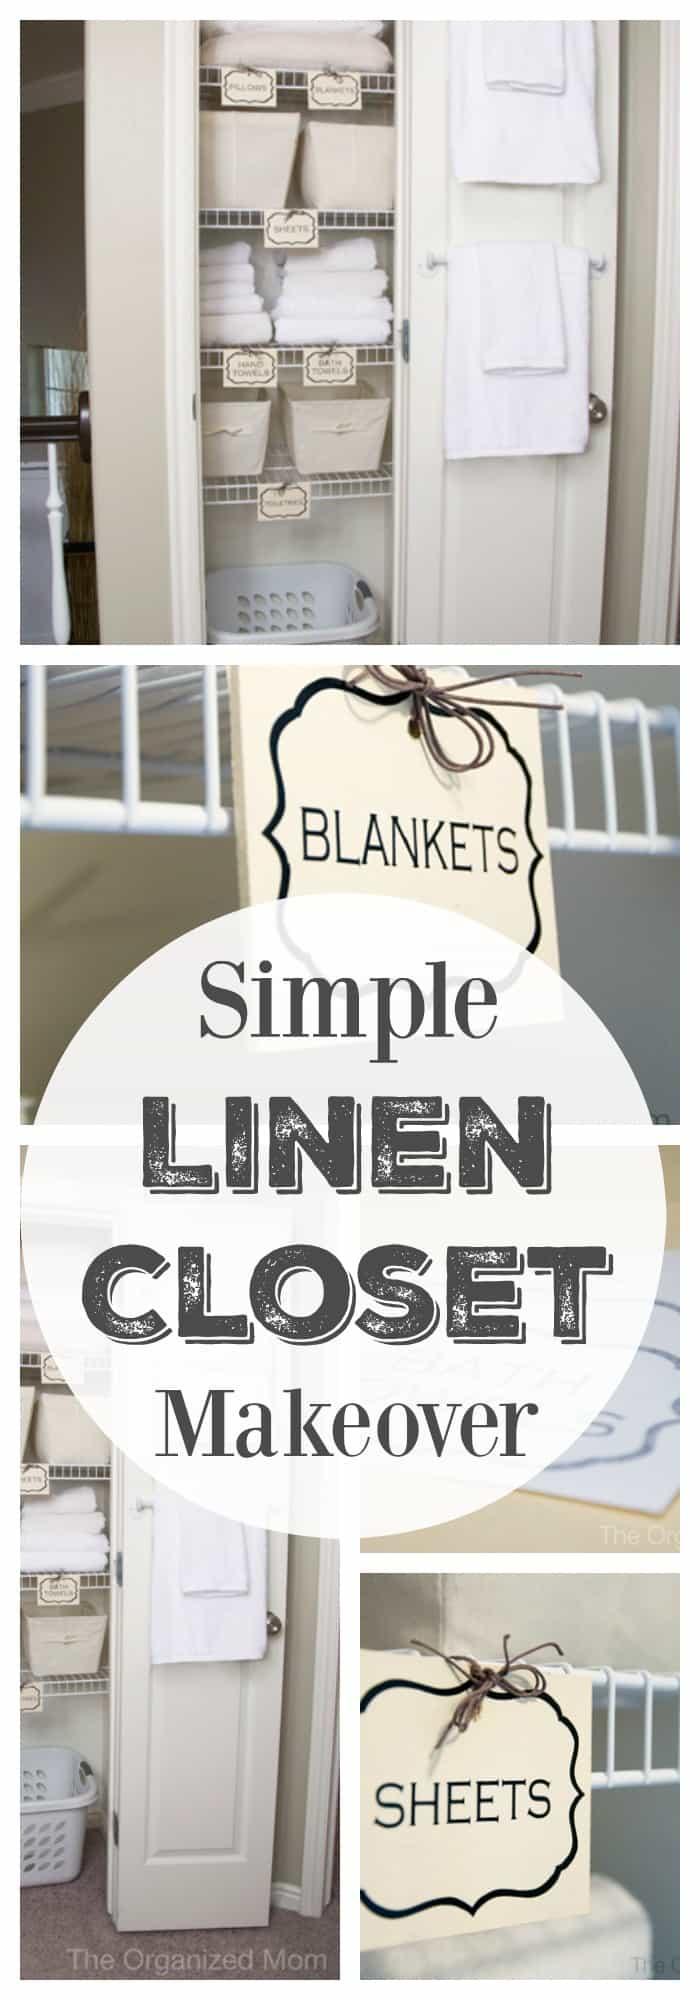 Simple linen closet makeover